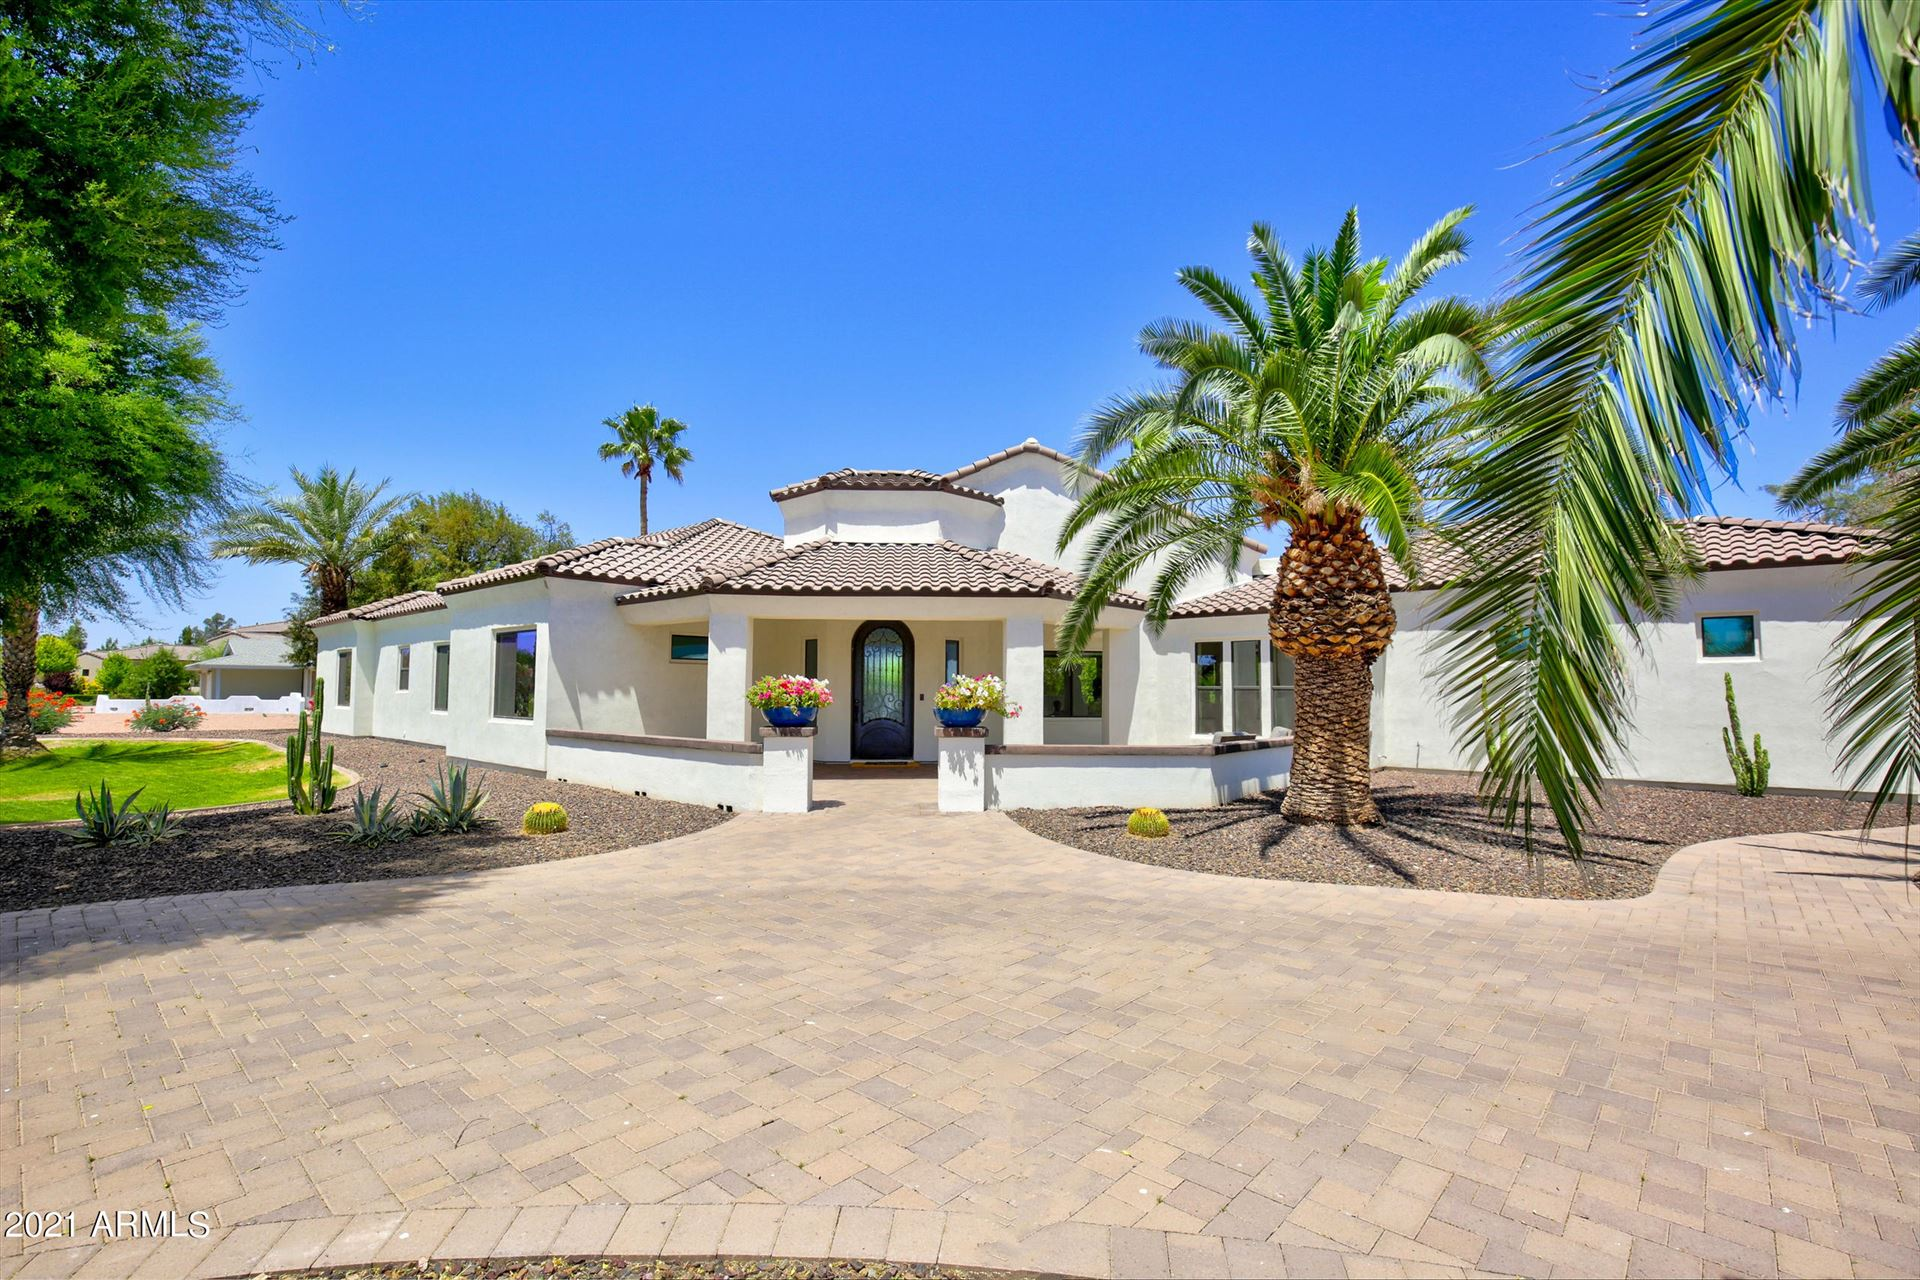 Photo of 6220 E COCHISE Road, Paradise Valley, AZ 85253 (MLS # 6244454)